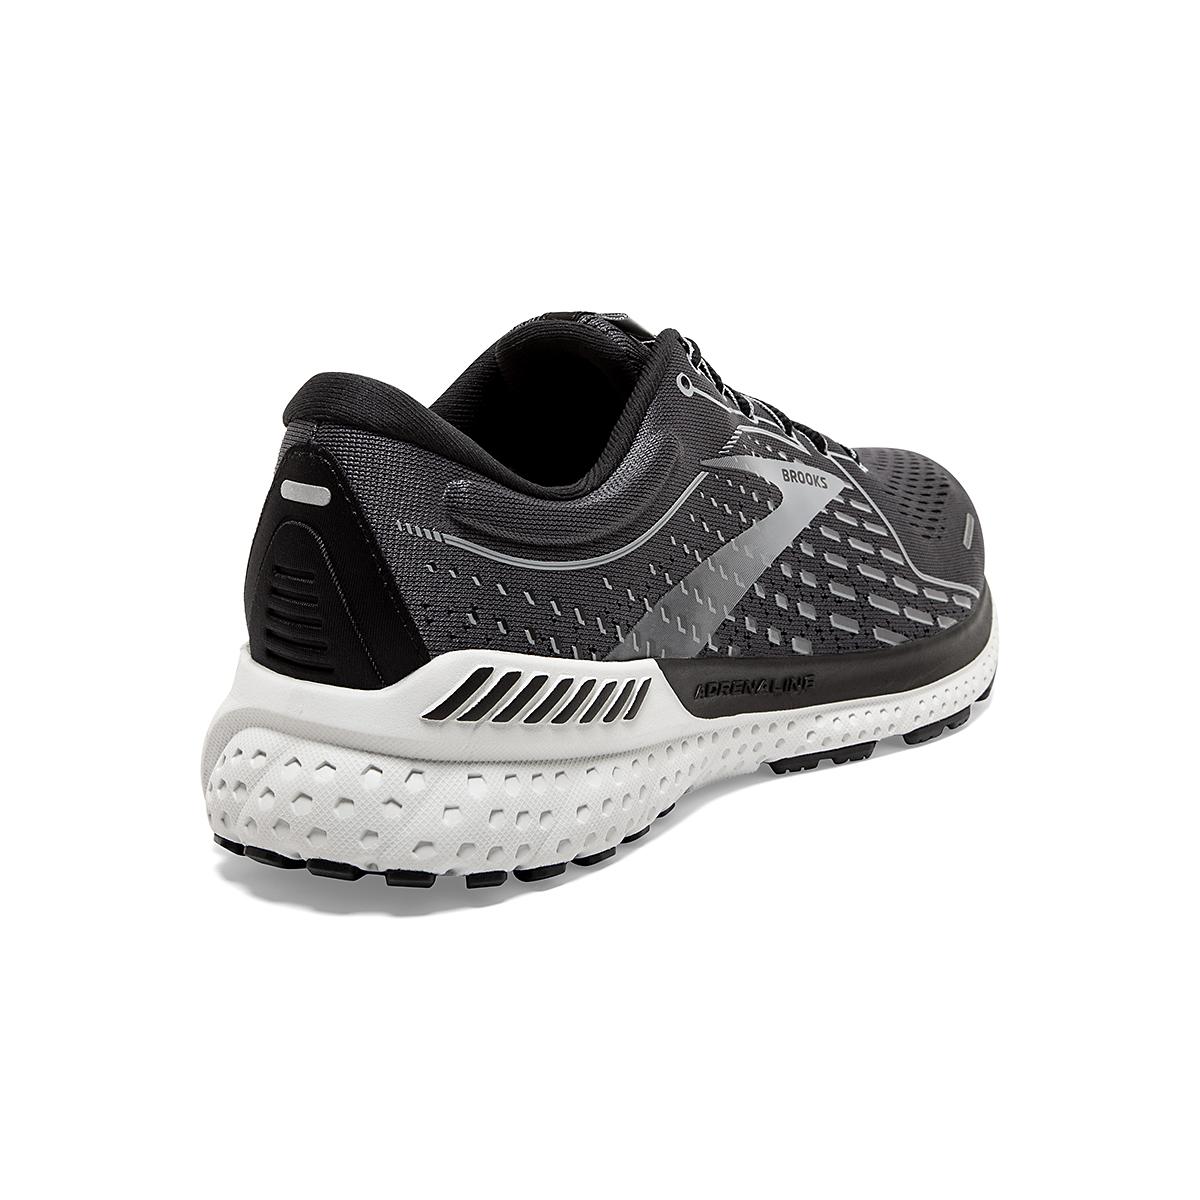 Men's Brooks Adrenaline GTS 21 Running Shoe - Color: Blackened Pearl - Size: 7 - Width: Regular, Blackened Pearl, large, image 4